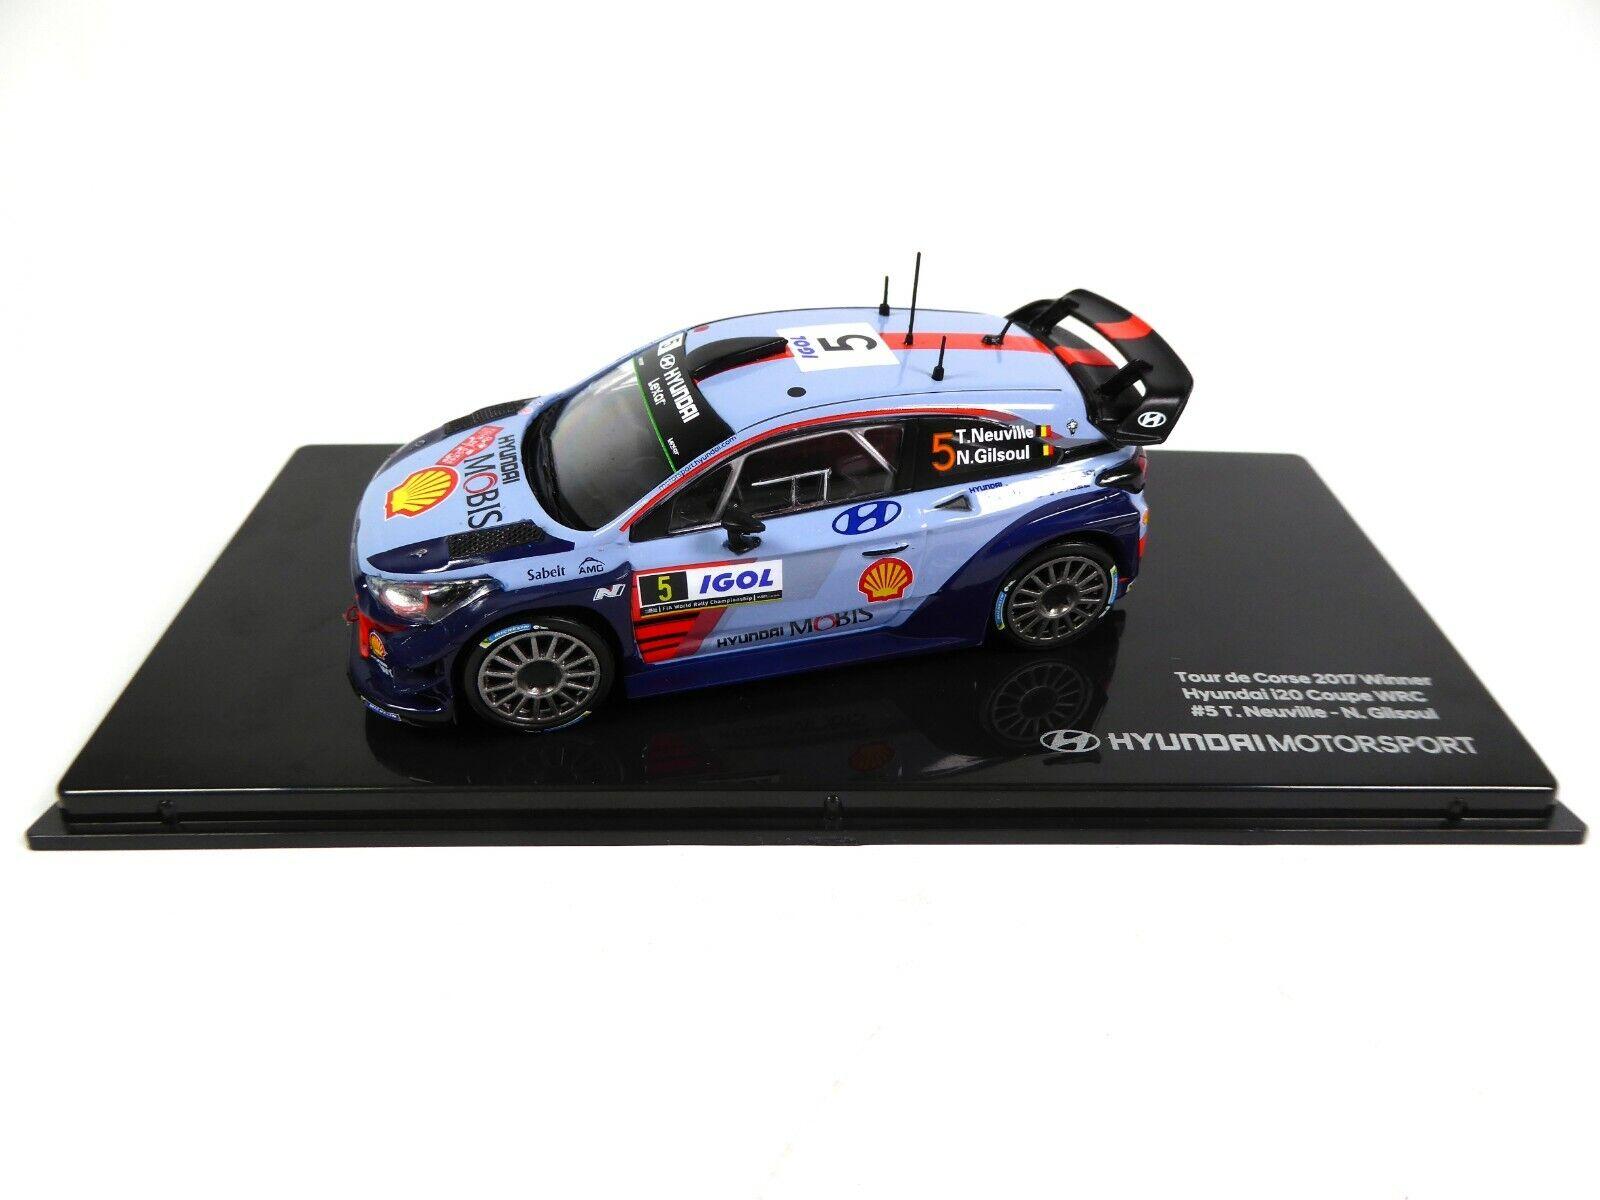 Hyundai i20 Coupé WRC #5 Ganador Rally Tour de Córcega 2017 Neuville,Gilsoul